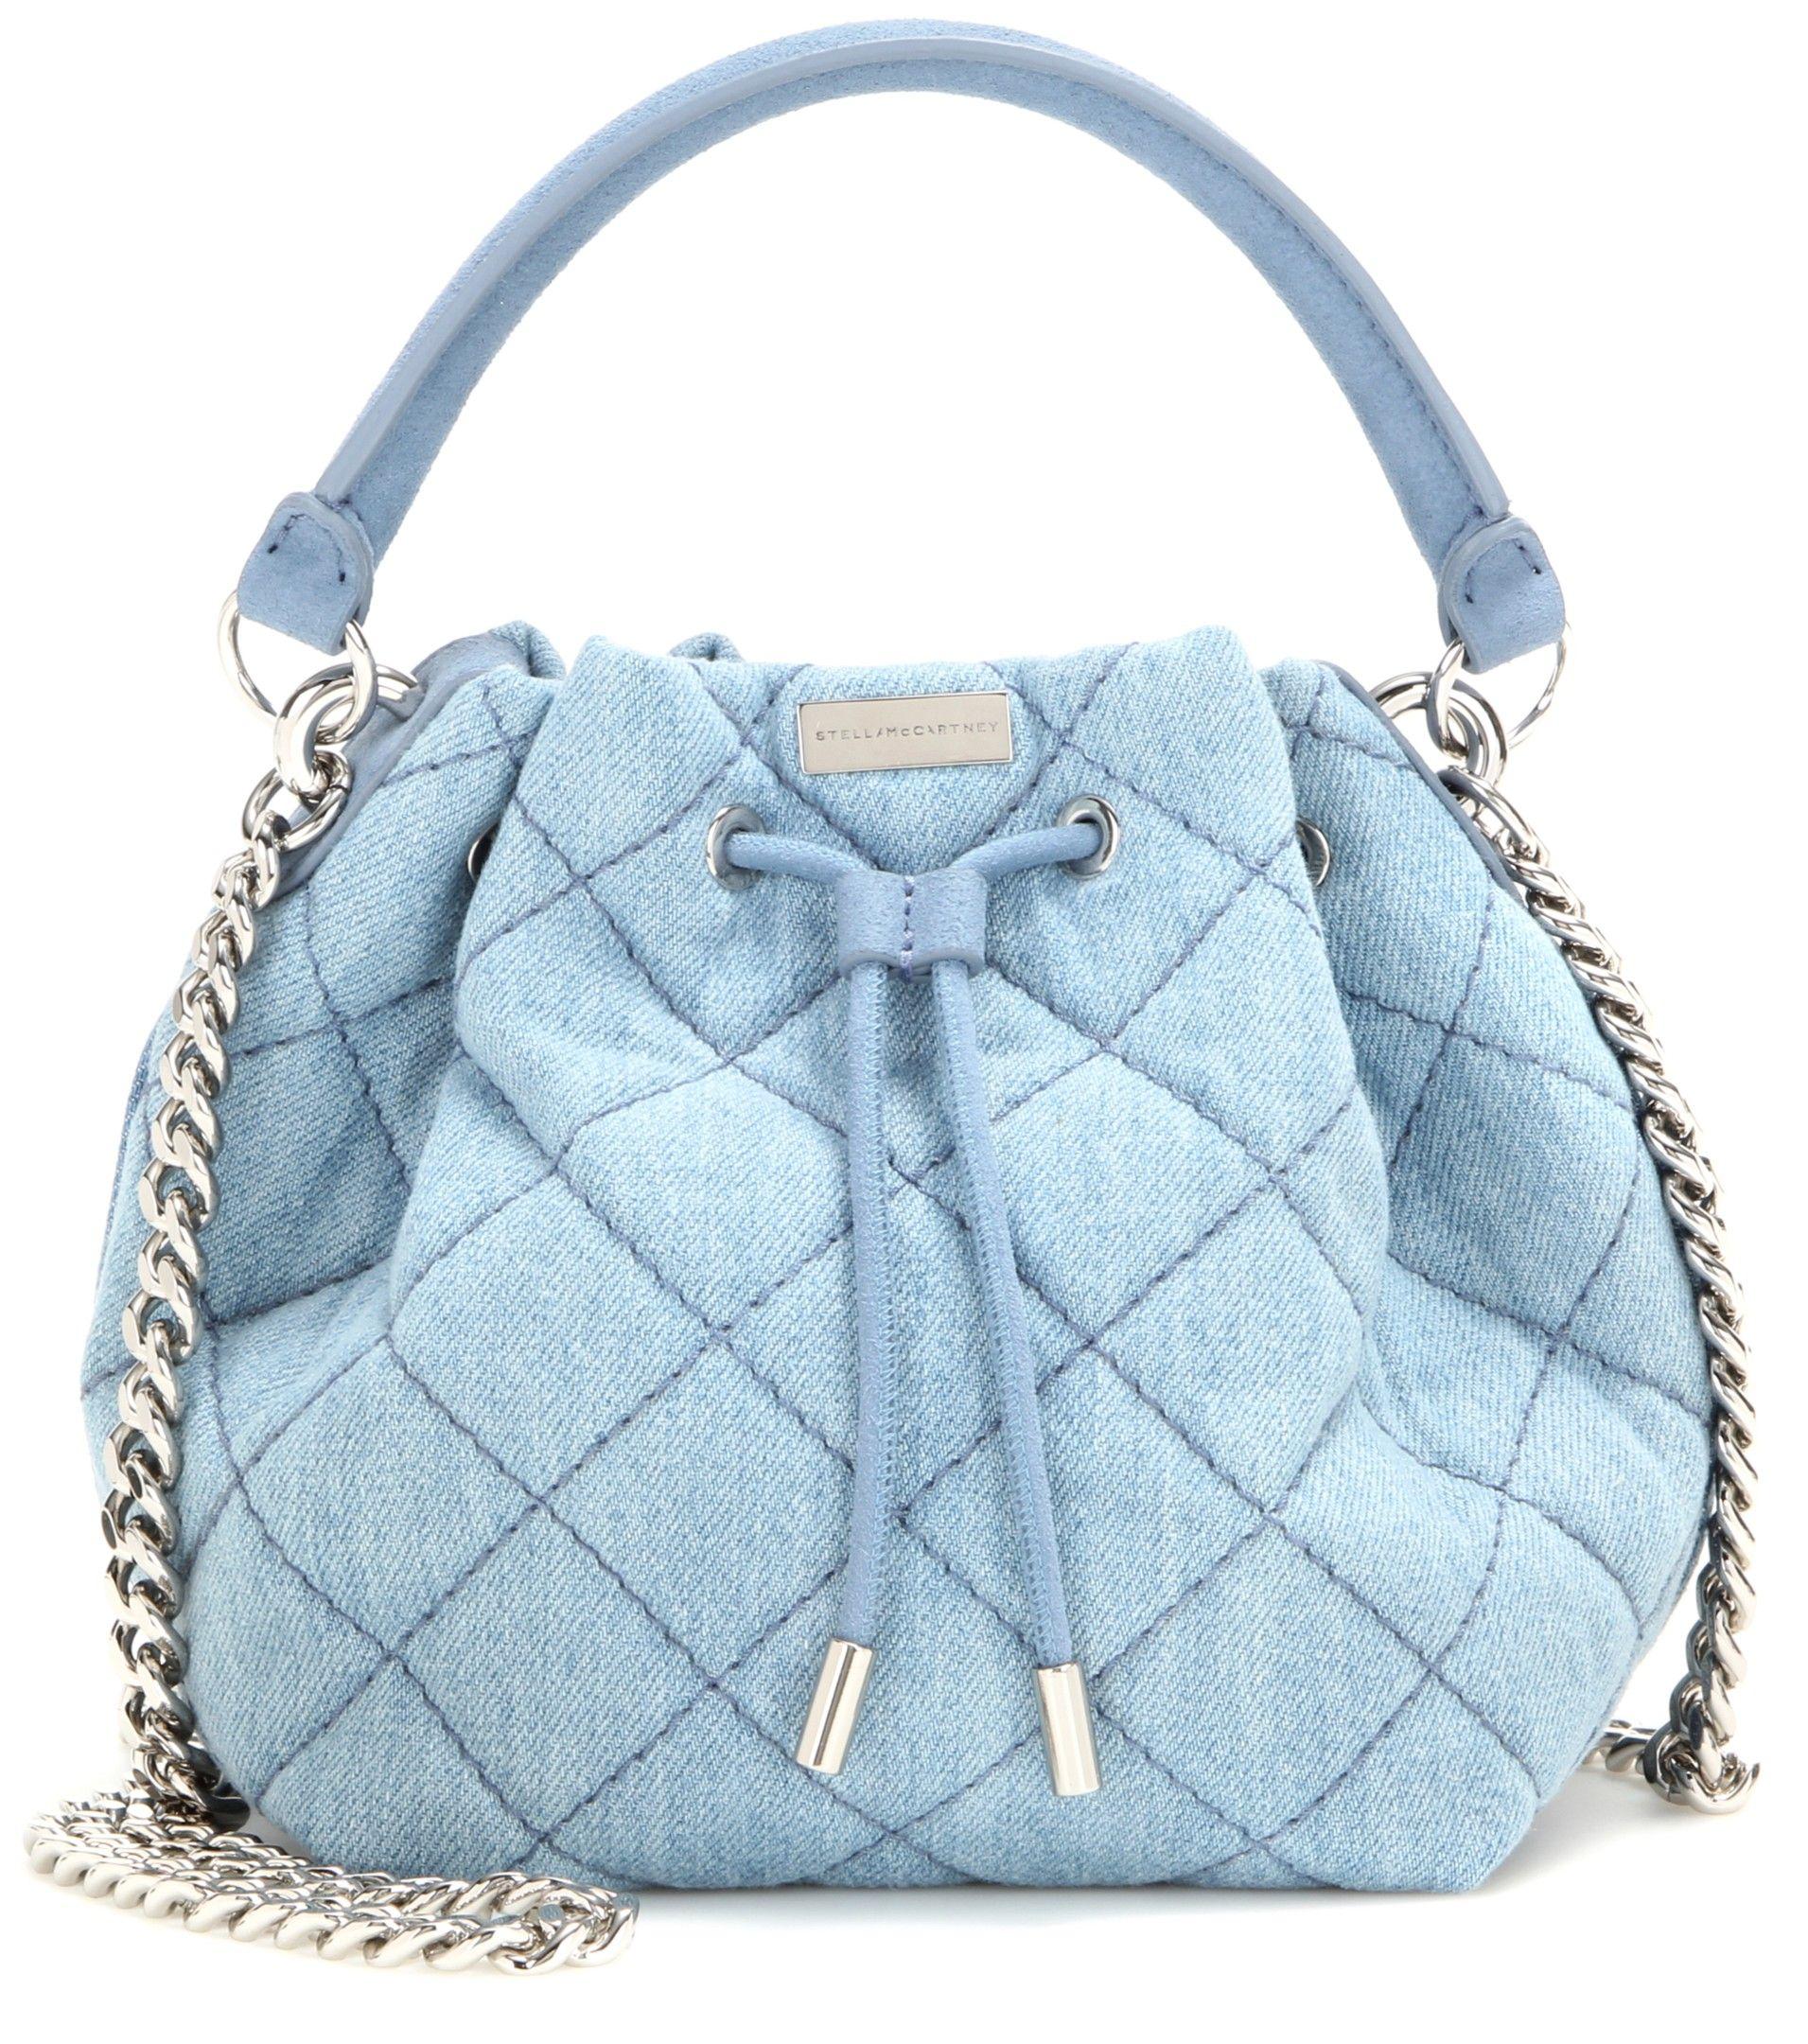 mytheresa.com - Soft Beckett Bucket Quilted Denim Bucket Bag ◊ Stella McCartney ☆ mytheresa - Luxury Fashion for Women / Designer clothing, shoes, bags